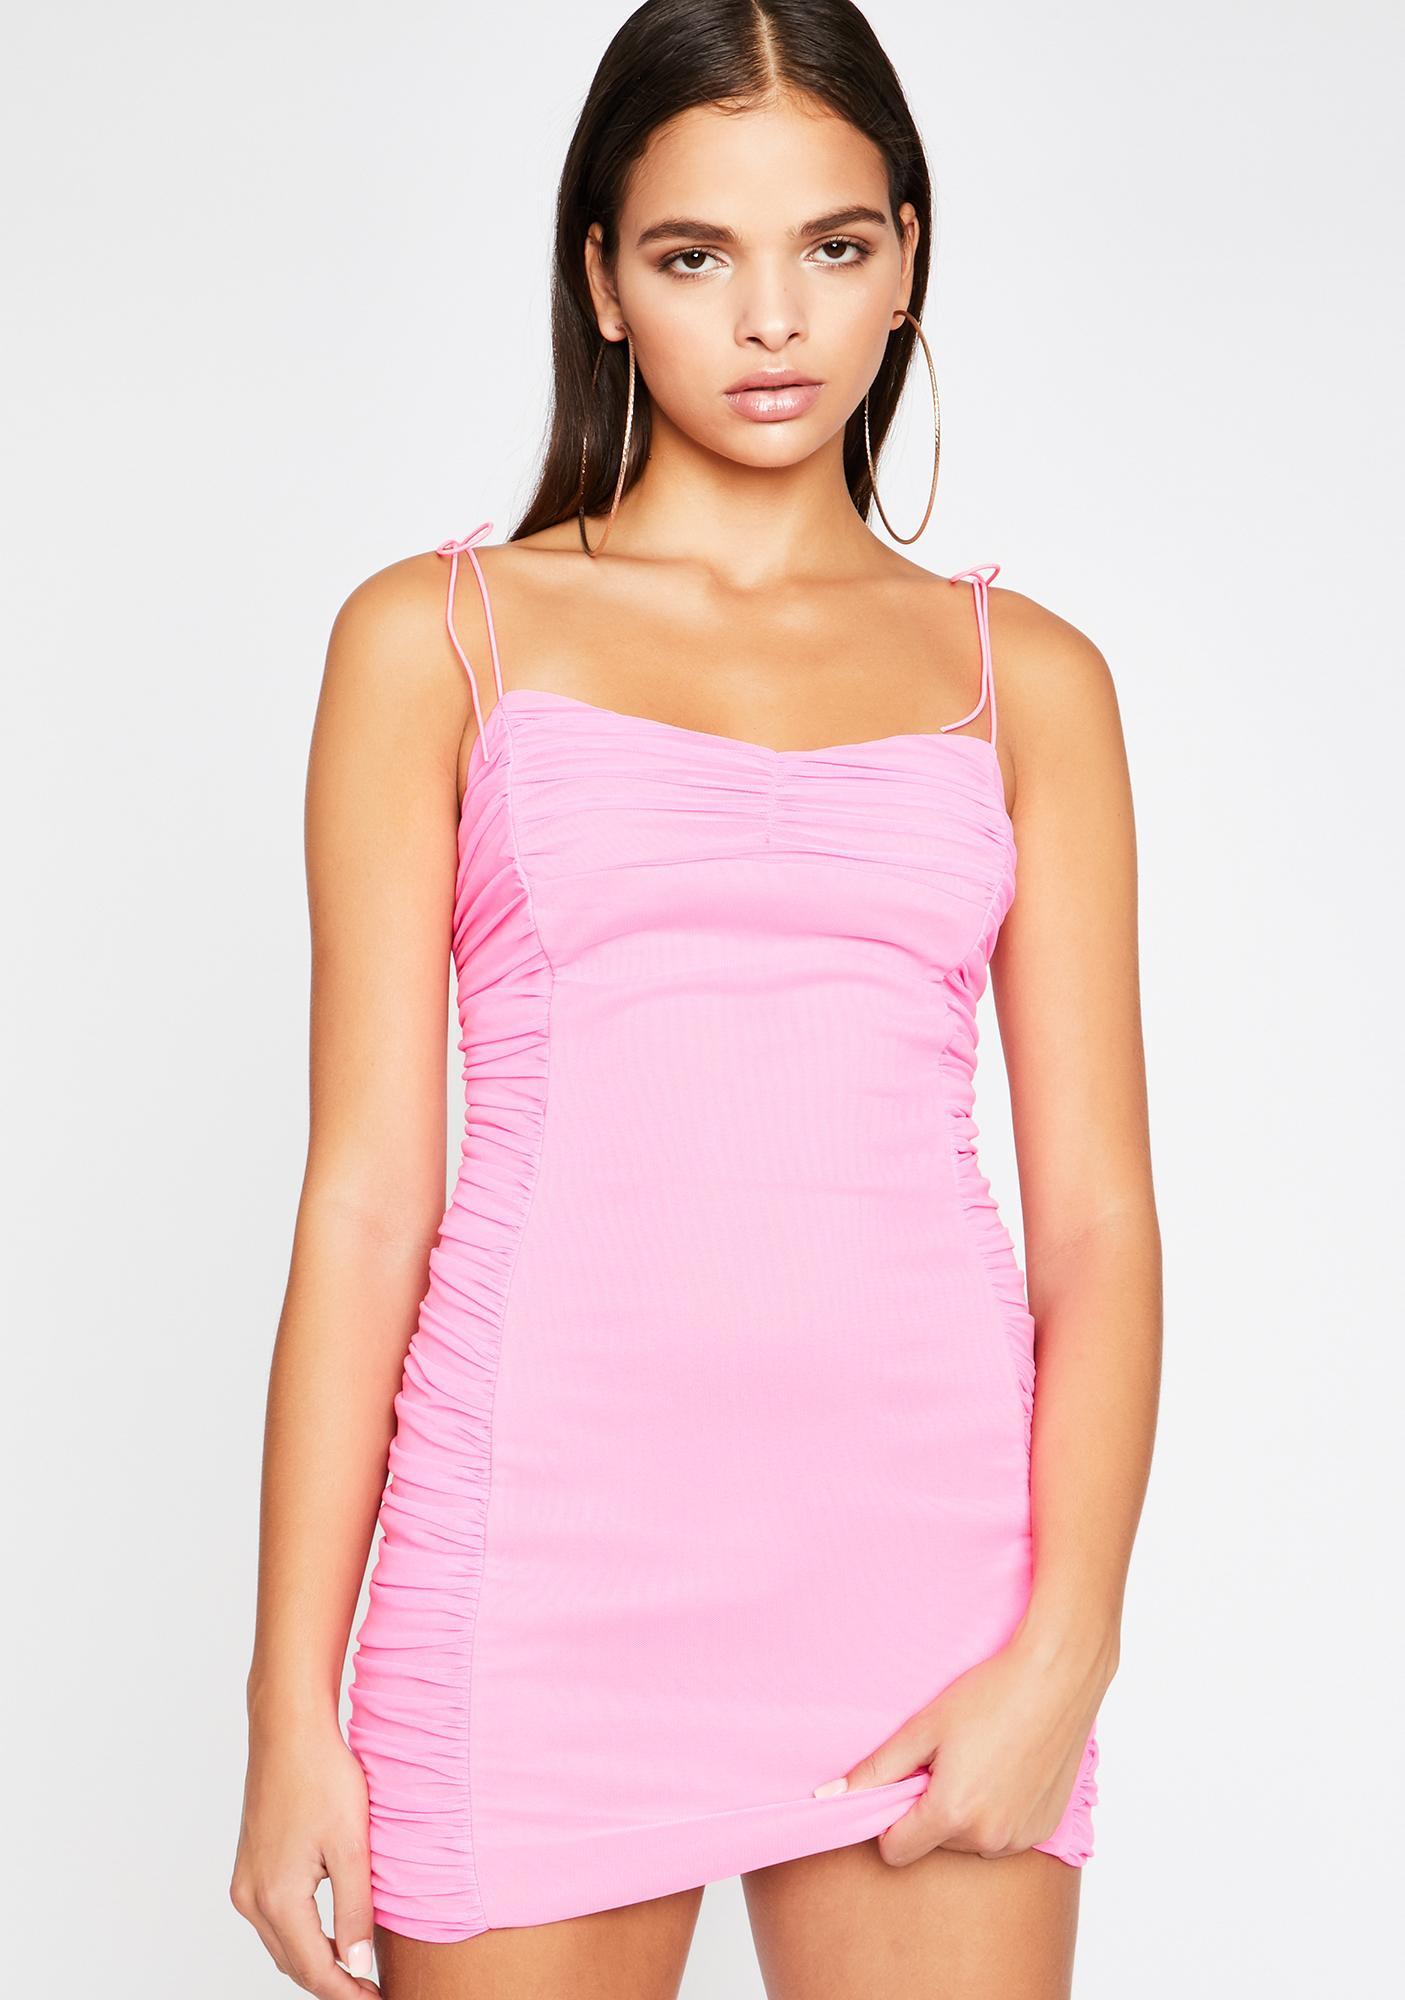 Bish U Thot Mini Dress